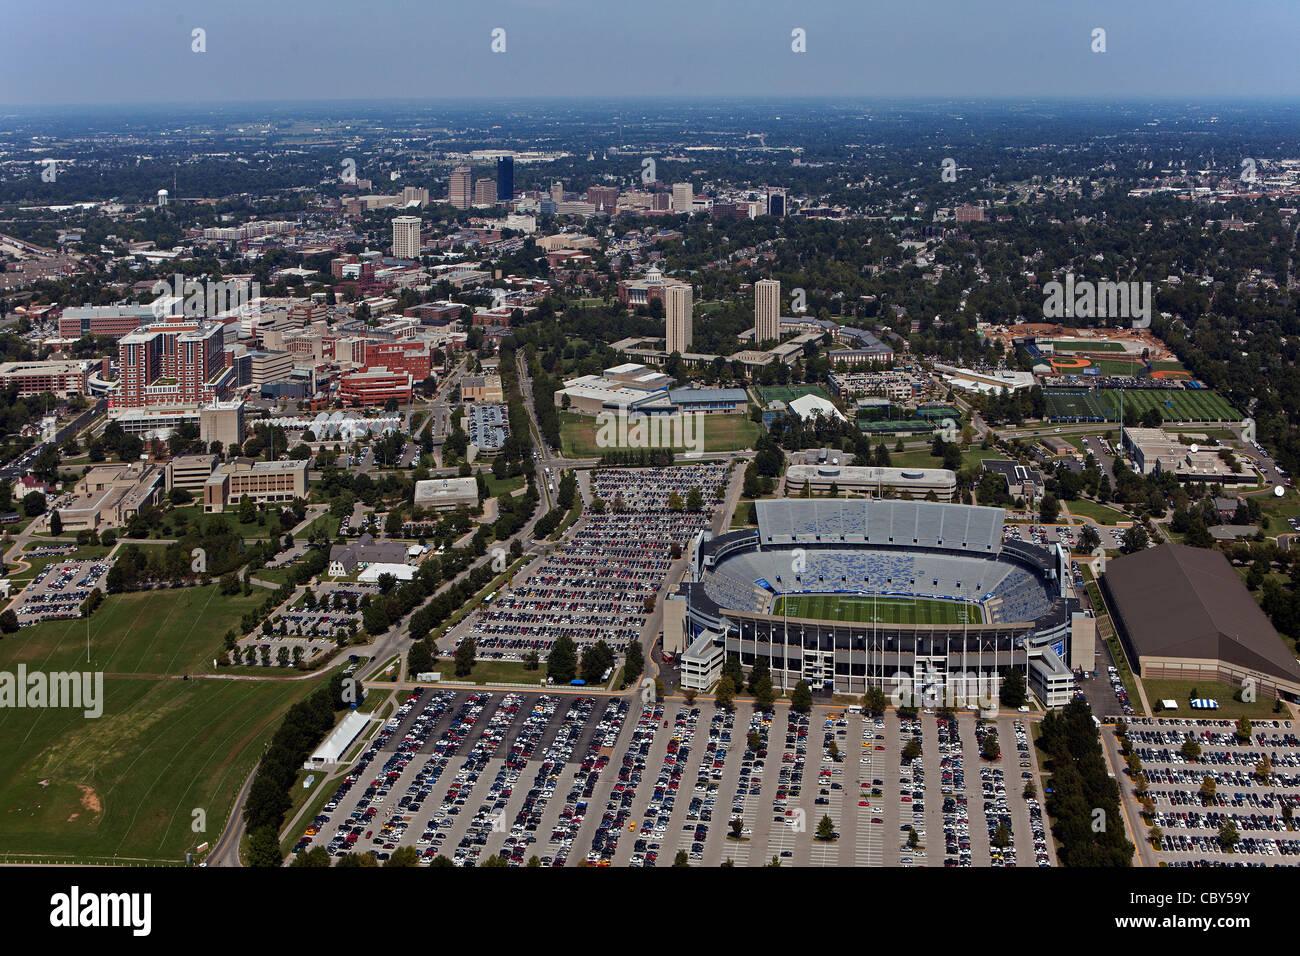 The University Of Kentucky And: University Of Kentucky Campus Stock Photos & University Of